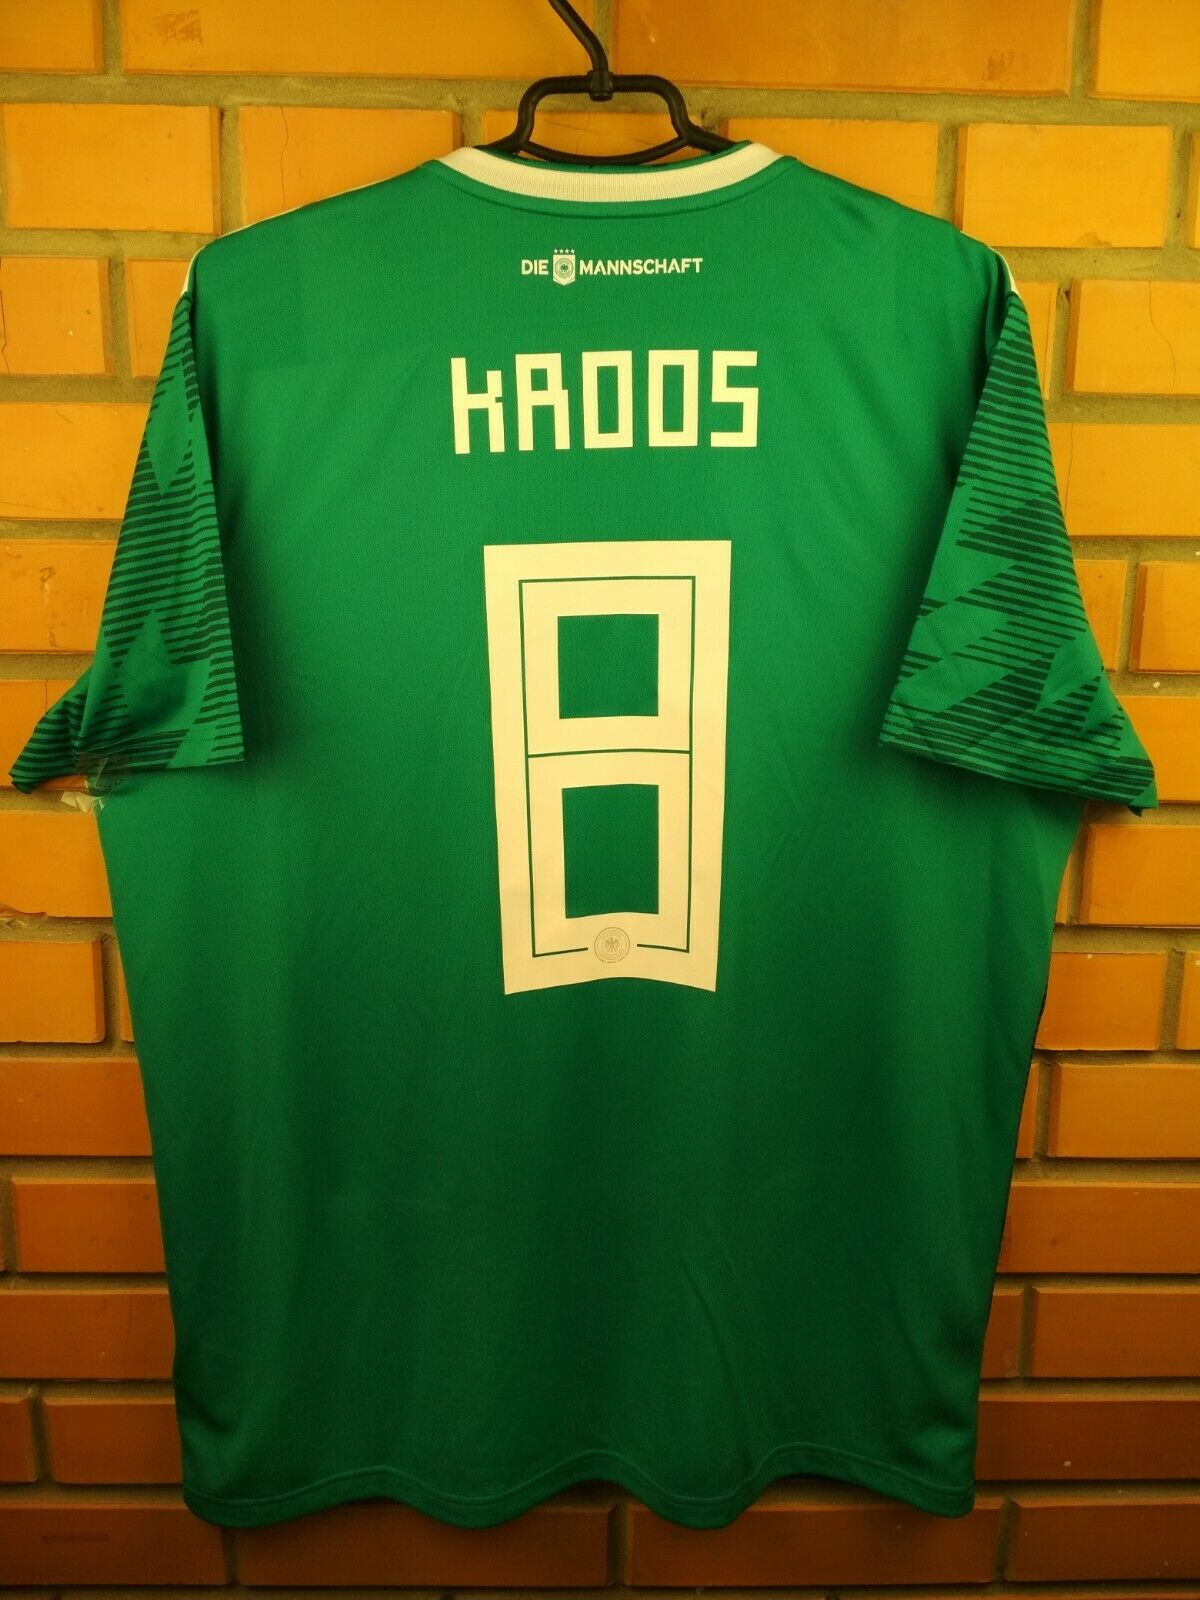 Kroos Geruomoy jersey XL 2019 away shirt BR3144 soccer footbtutti Adidas